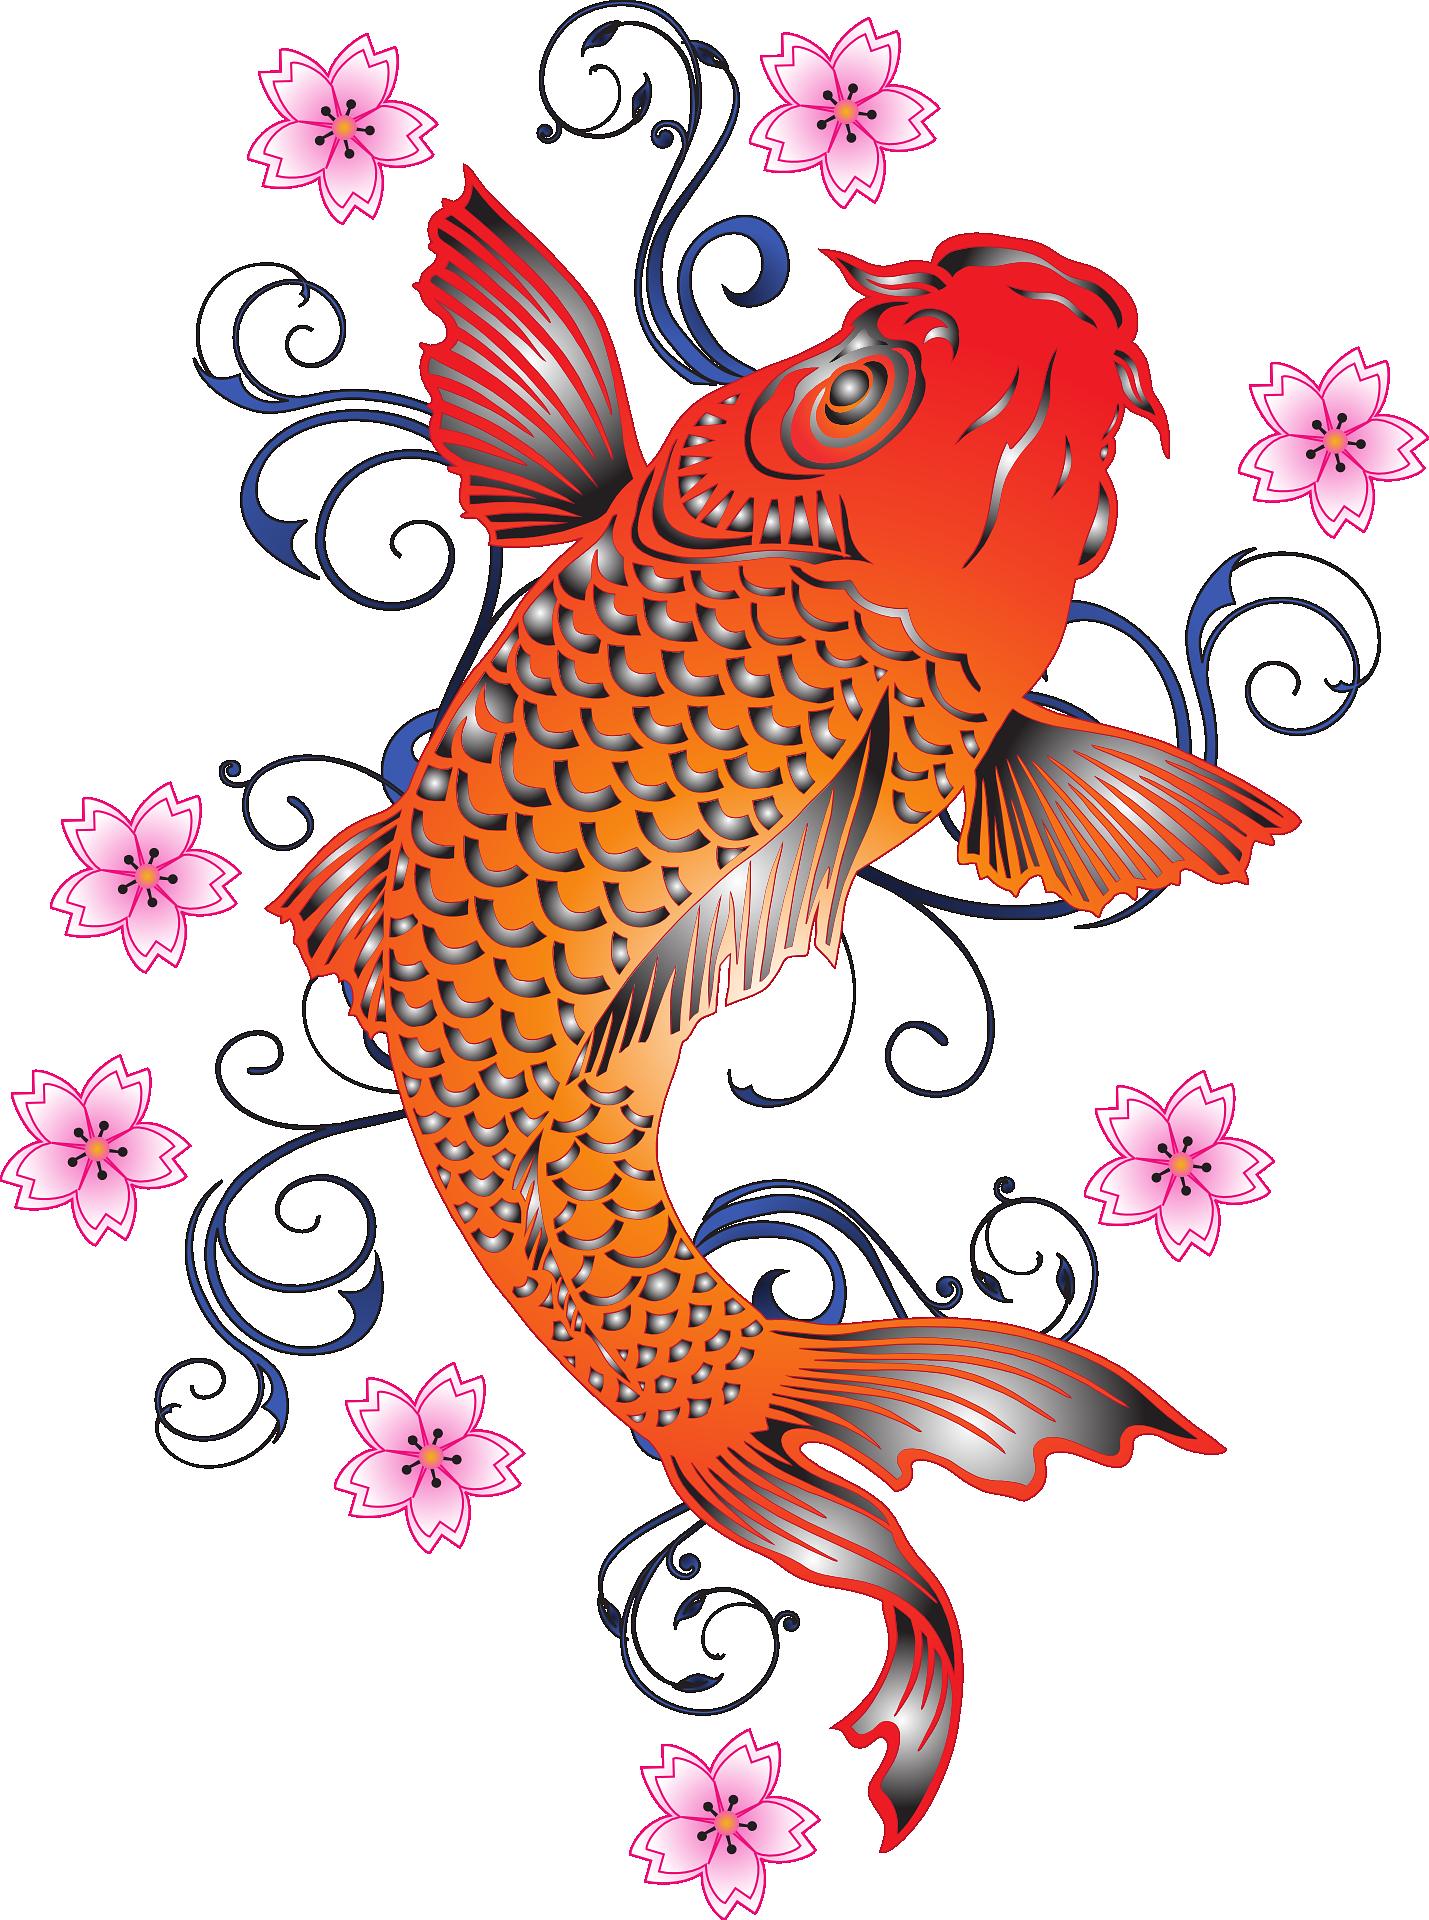 Koi Fish Sticker Design Element Free Image By Rawpixel Com Noon Koi Fish Designs Koi Fish Drawing Fish Graphic